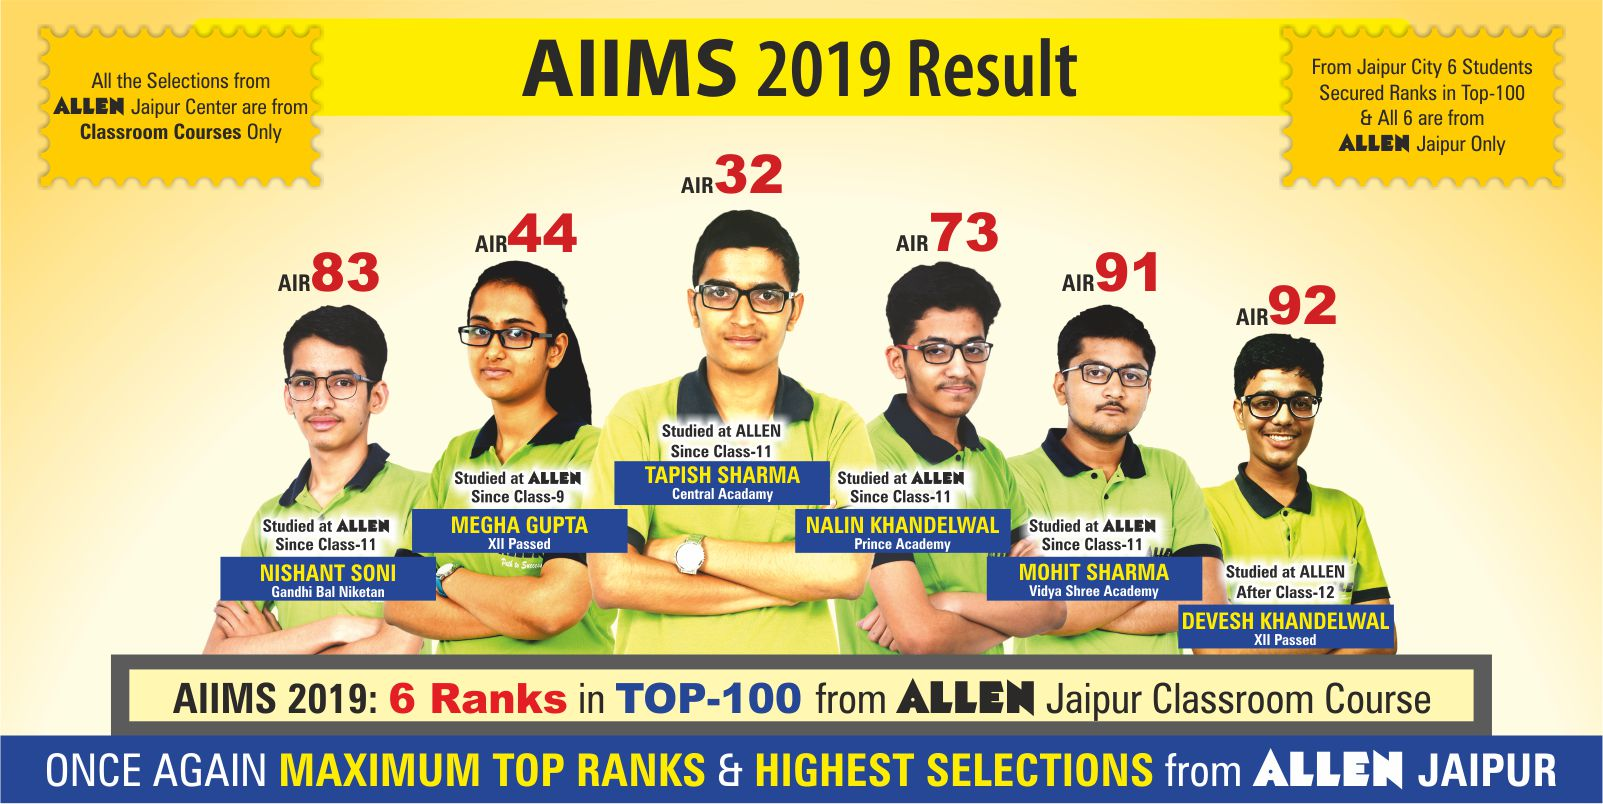 AIIMS-2019